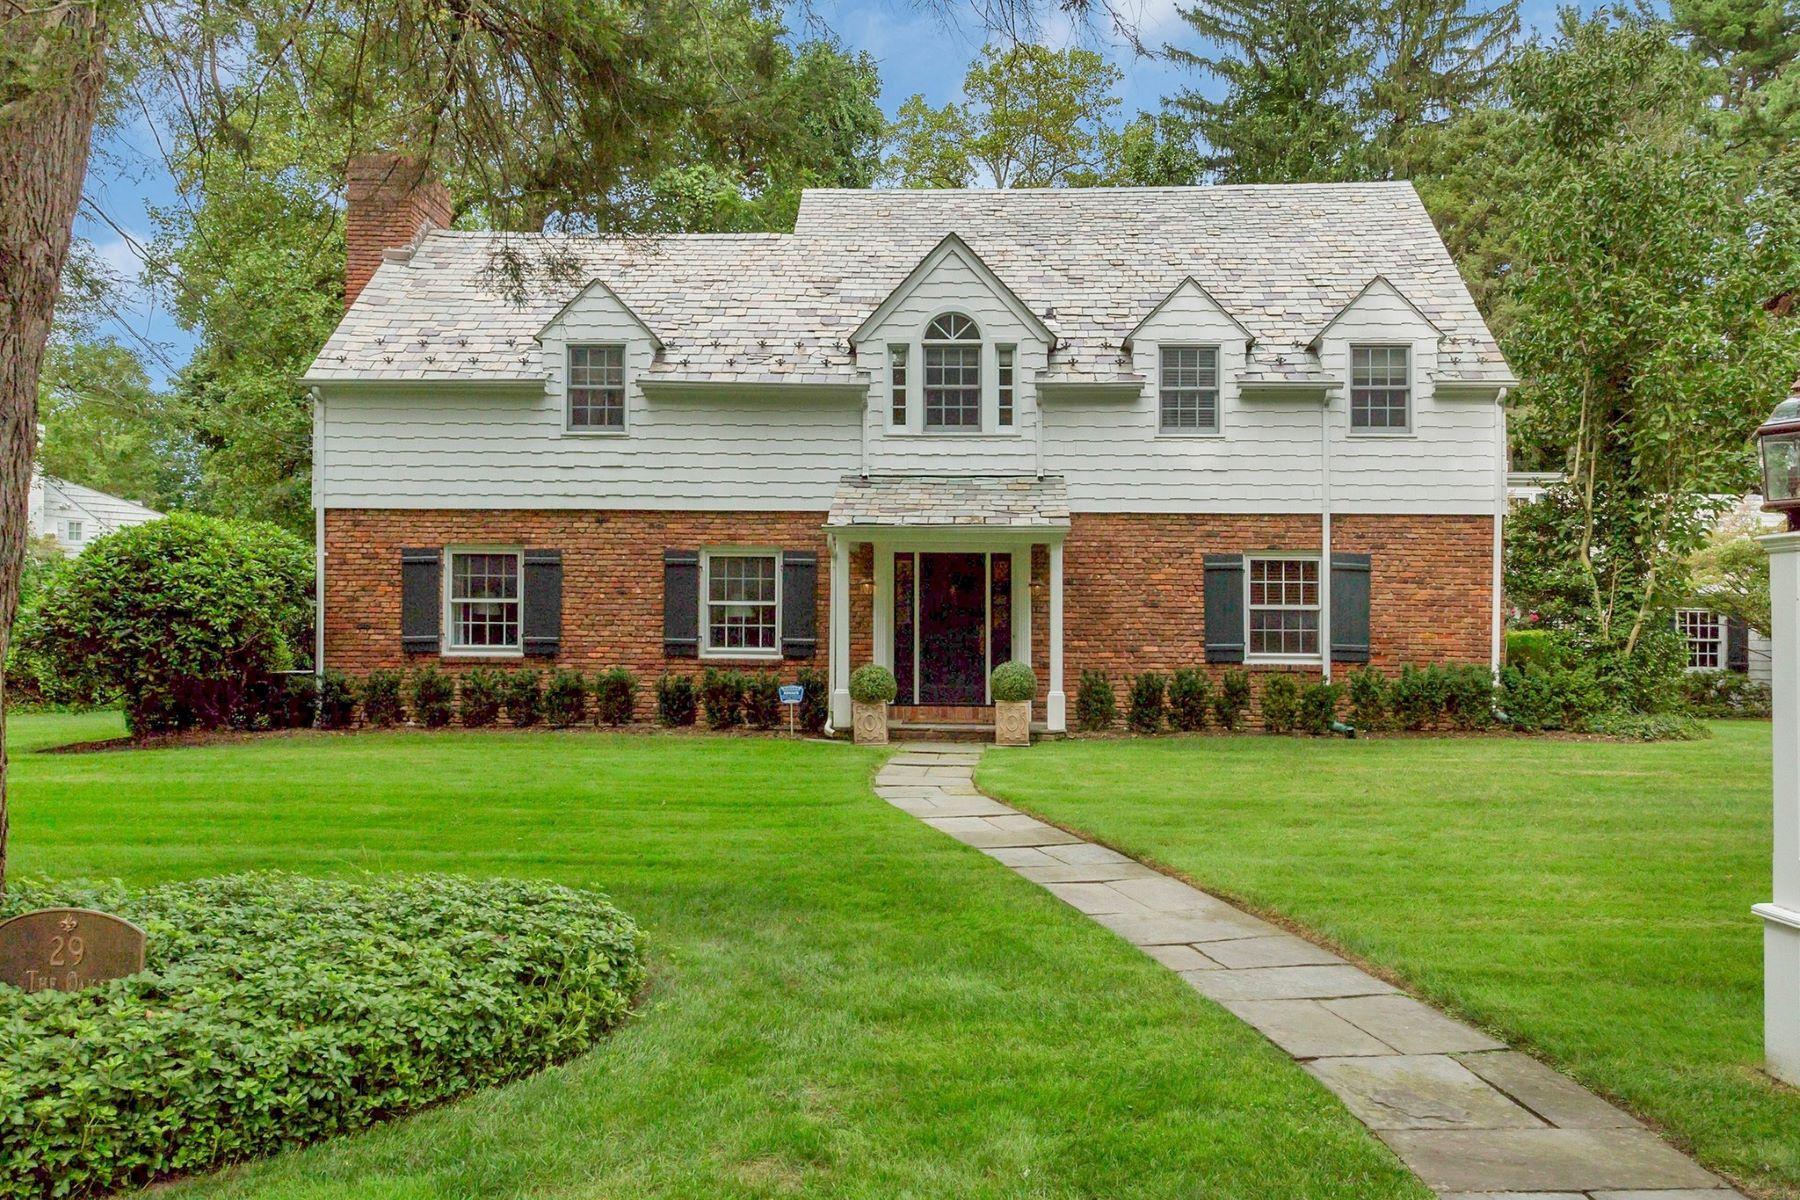 Single Family Homes for Active at Roslyn Estates 29 The Oaks Roslyn Estates, New York 11576 United States